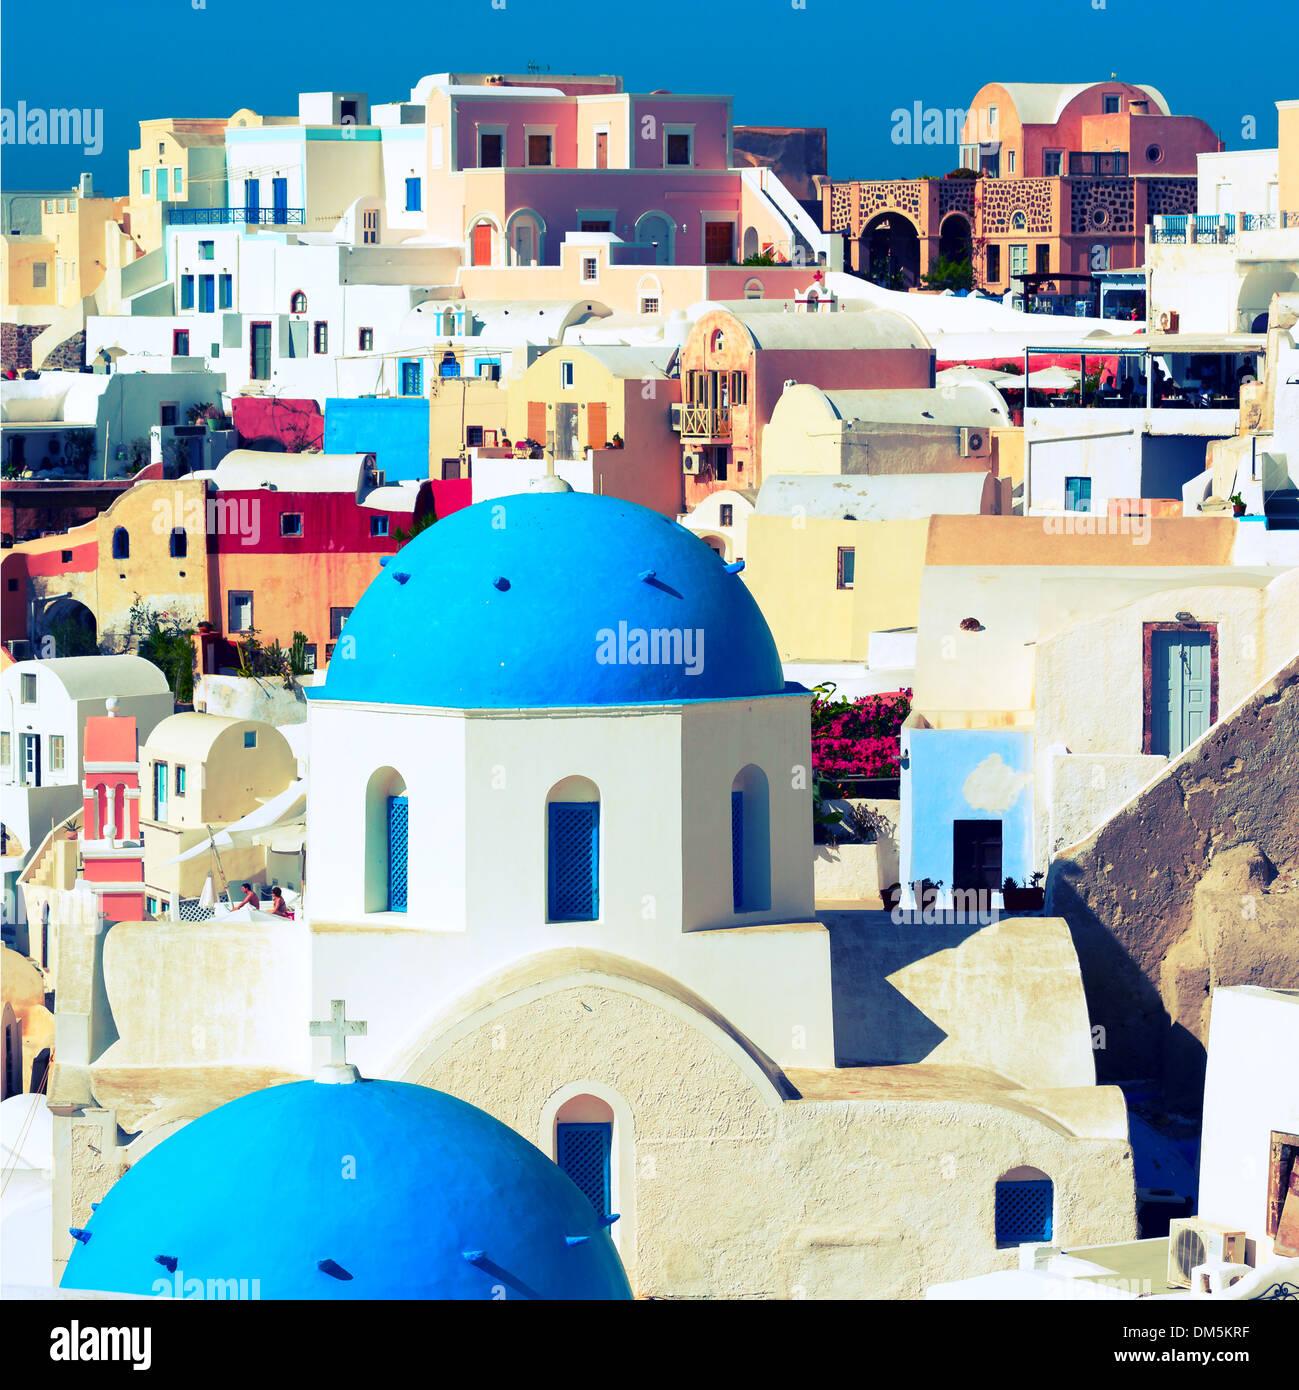 Orthodox church on the island of Santorini, Greece - Stock Image